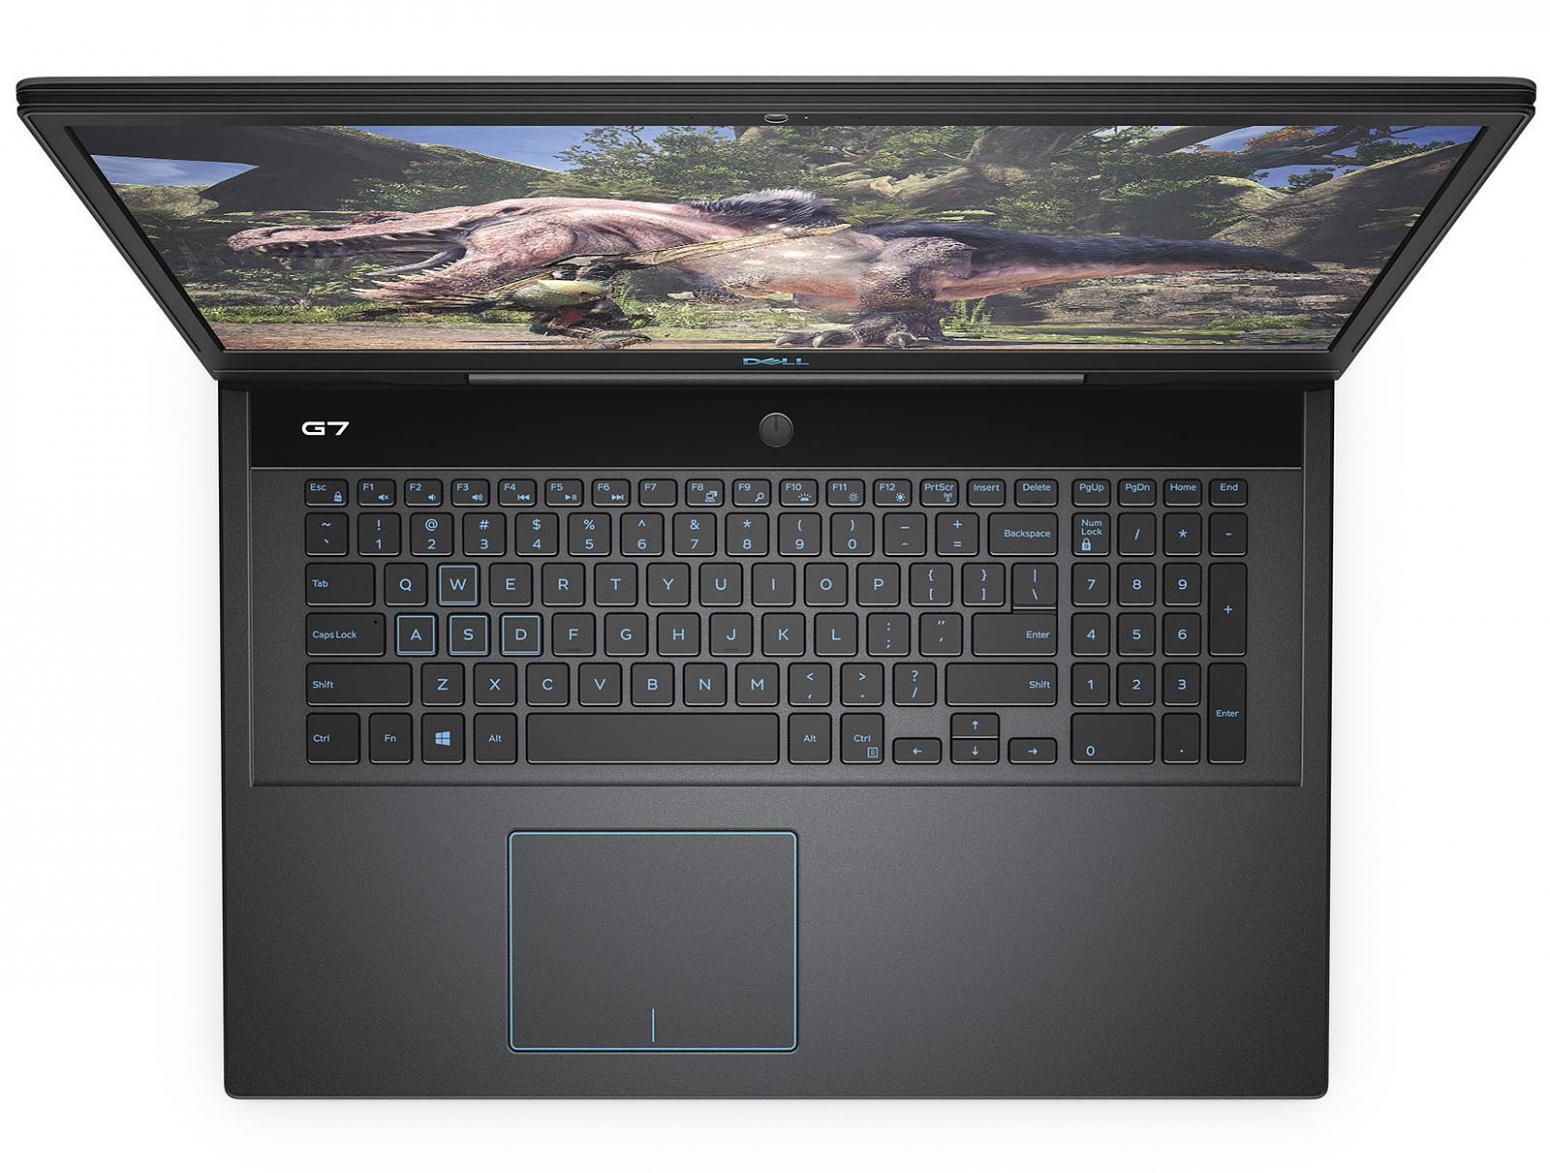 Ordinateur portable Dell G7 17 7790 (29D8X) Noir - RTX 2060, Hexa Core i7 - photo 3